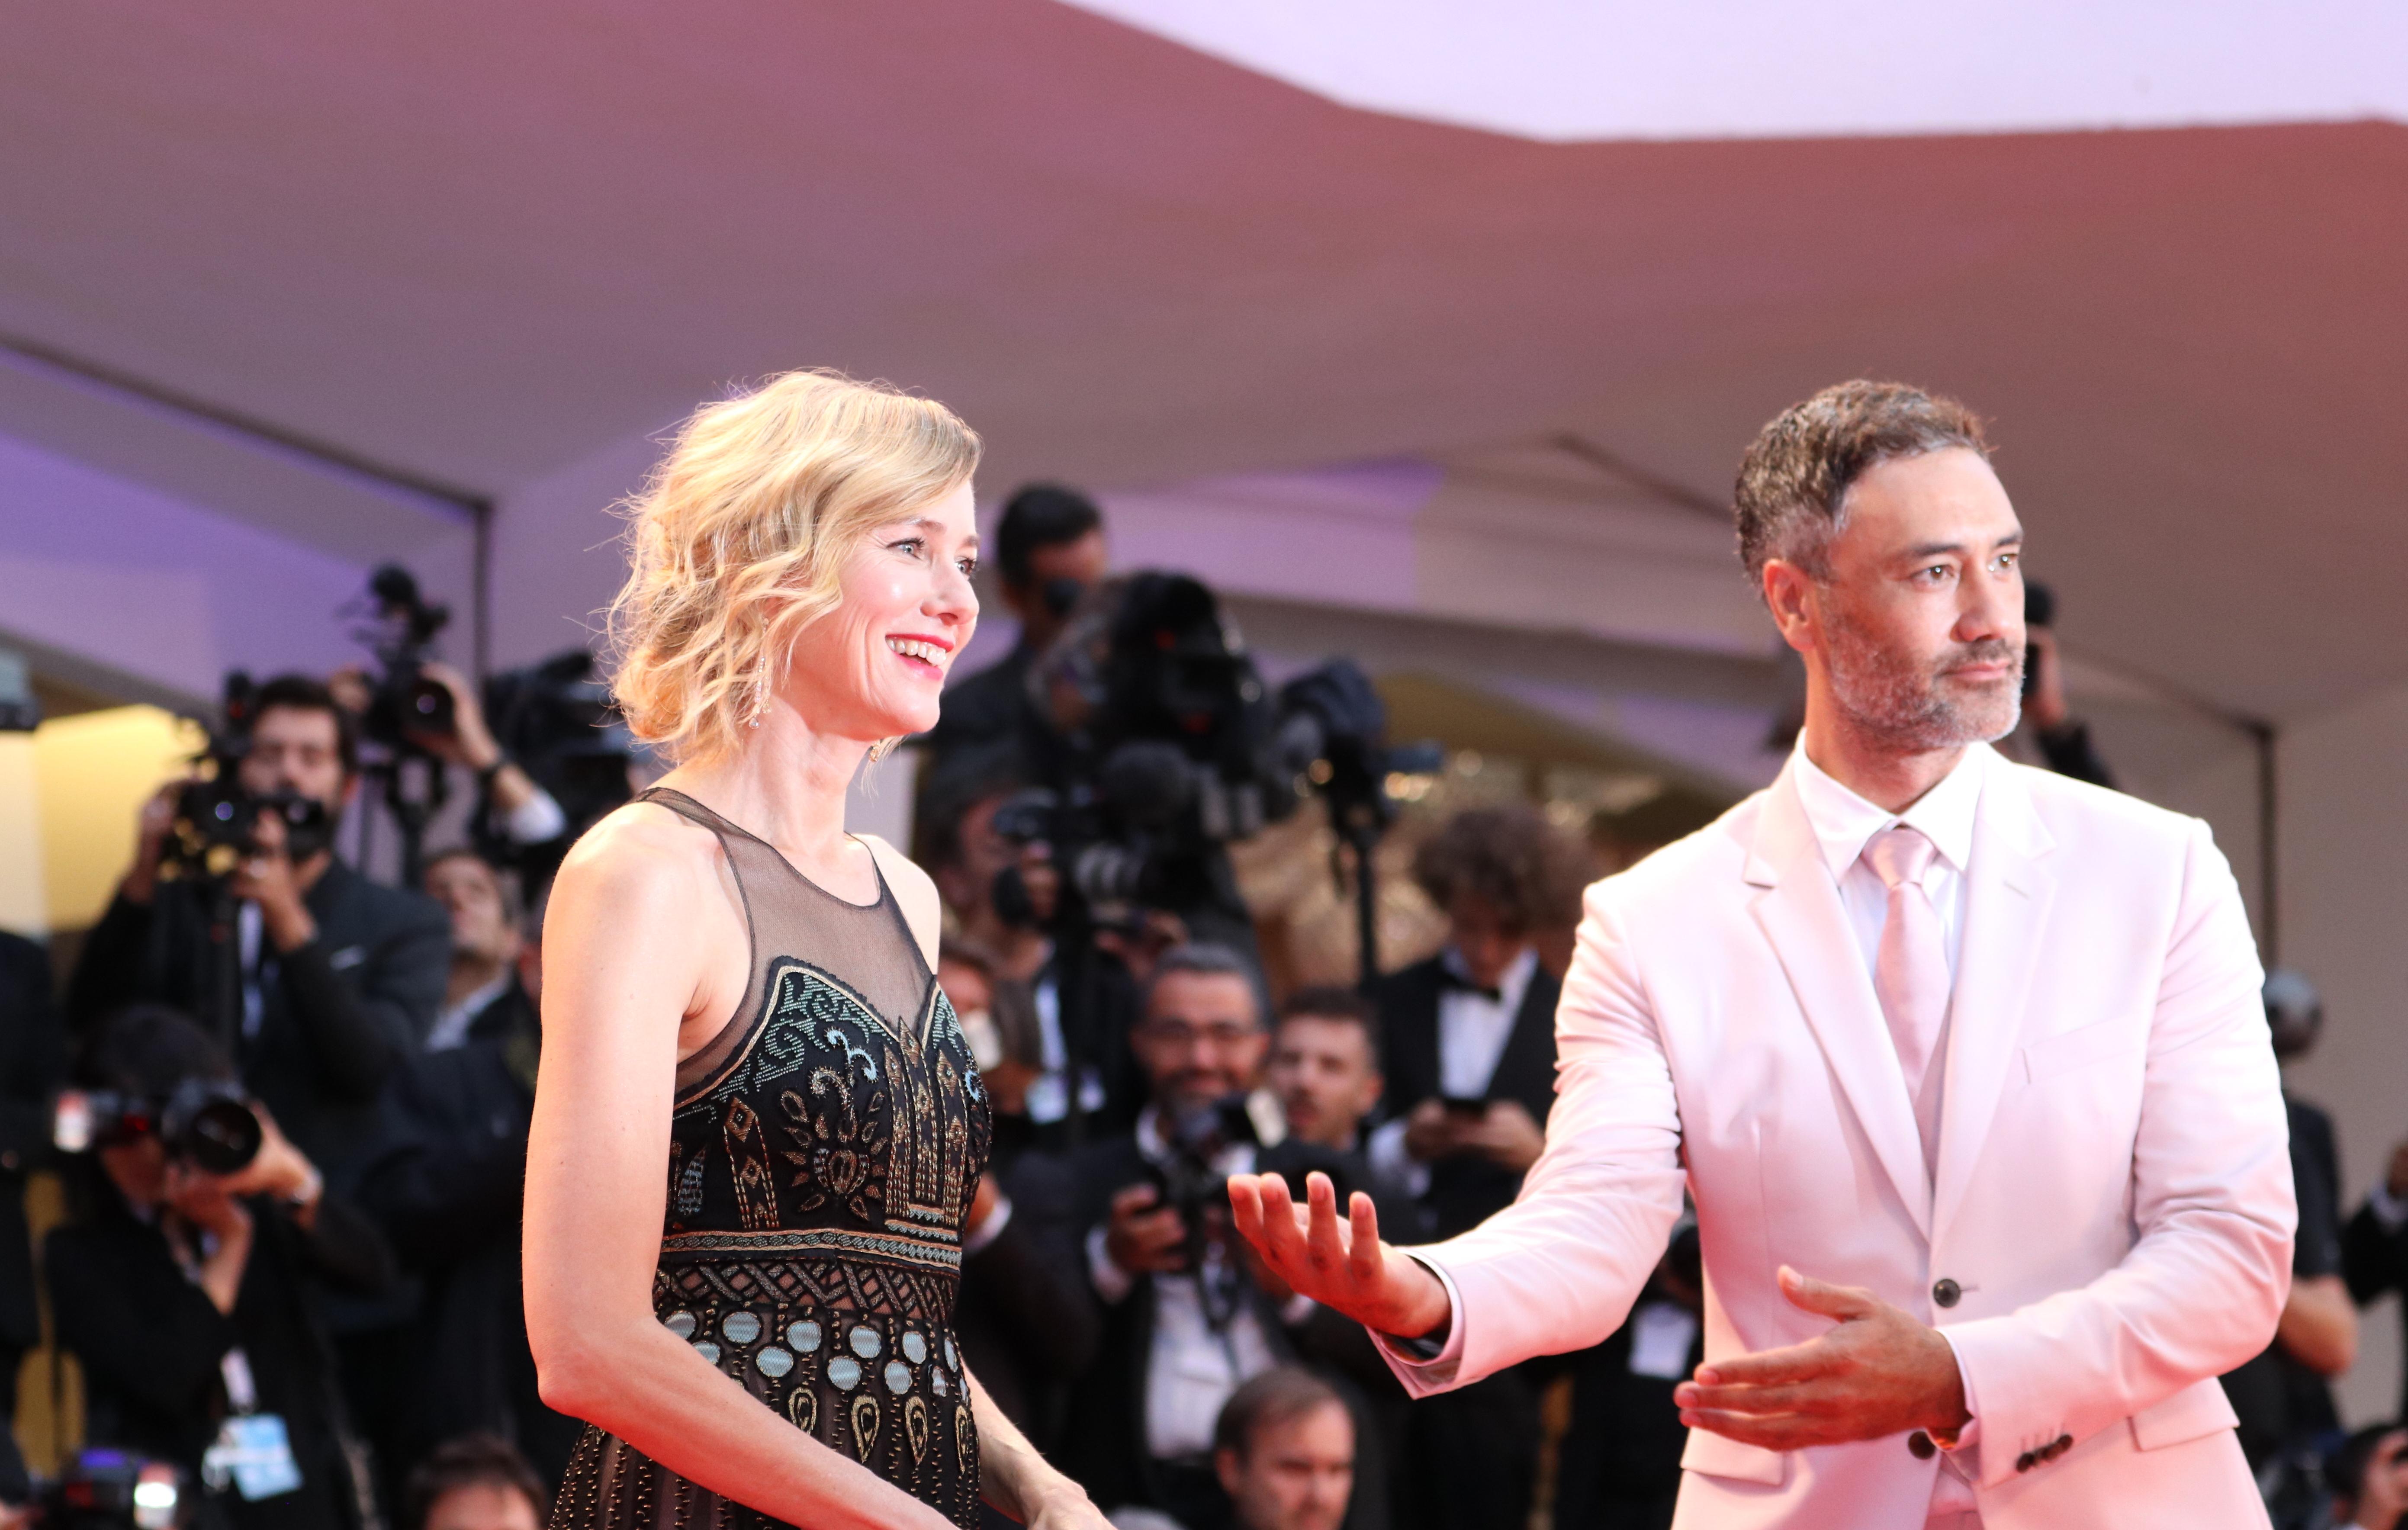 Venezia 2018: Taika Waititi e Naomi Watts sul red carpet di Suspiria